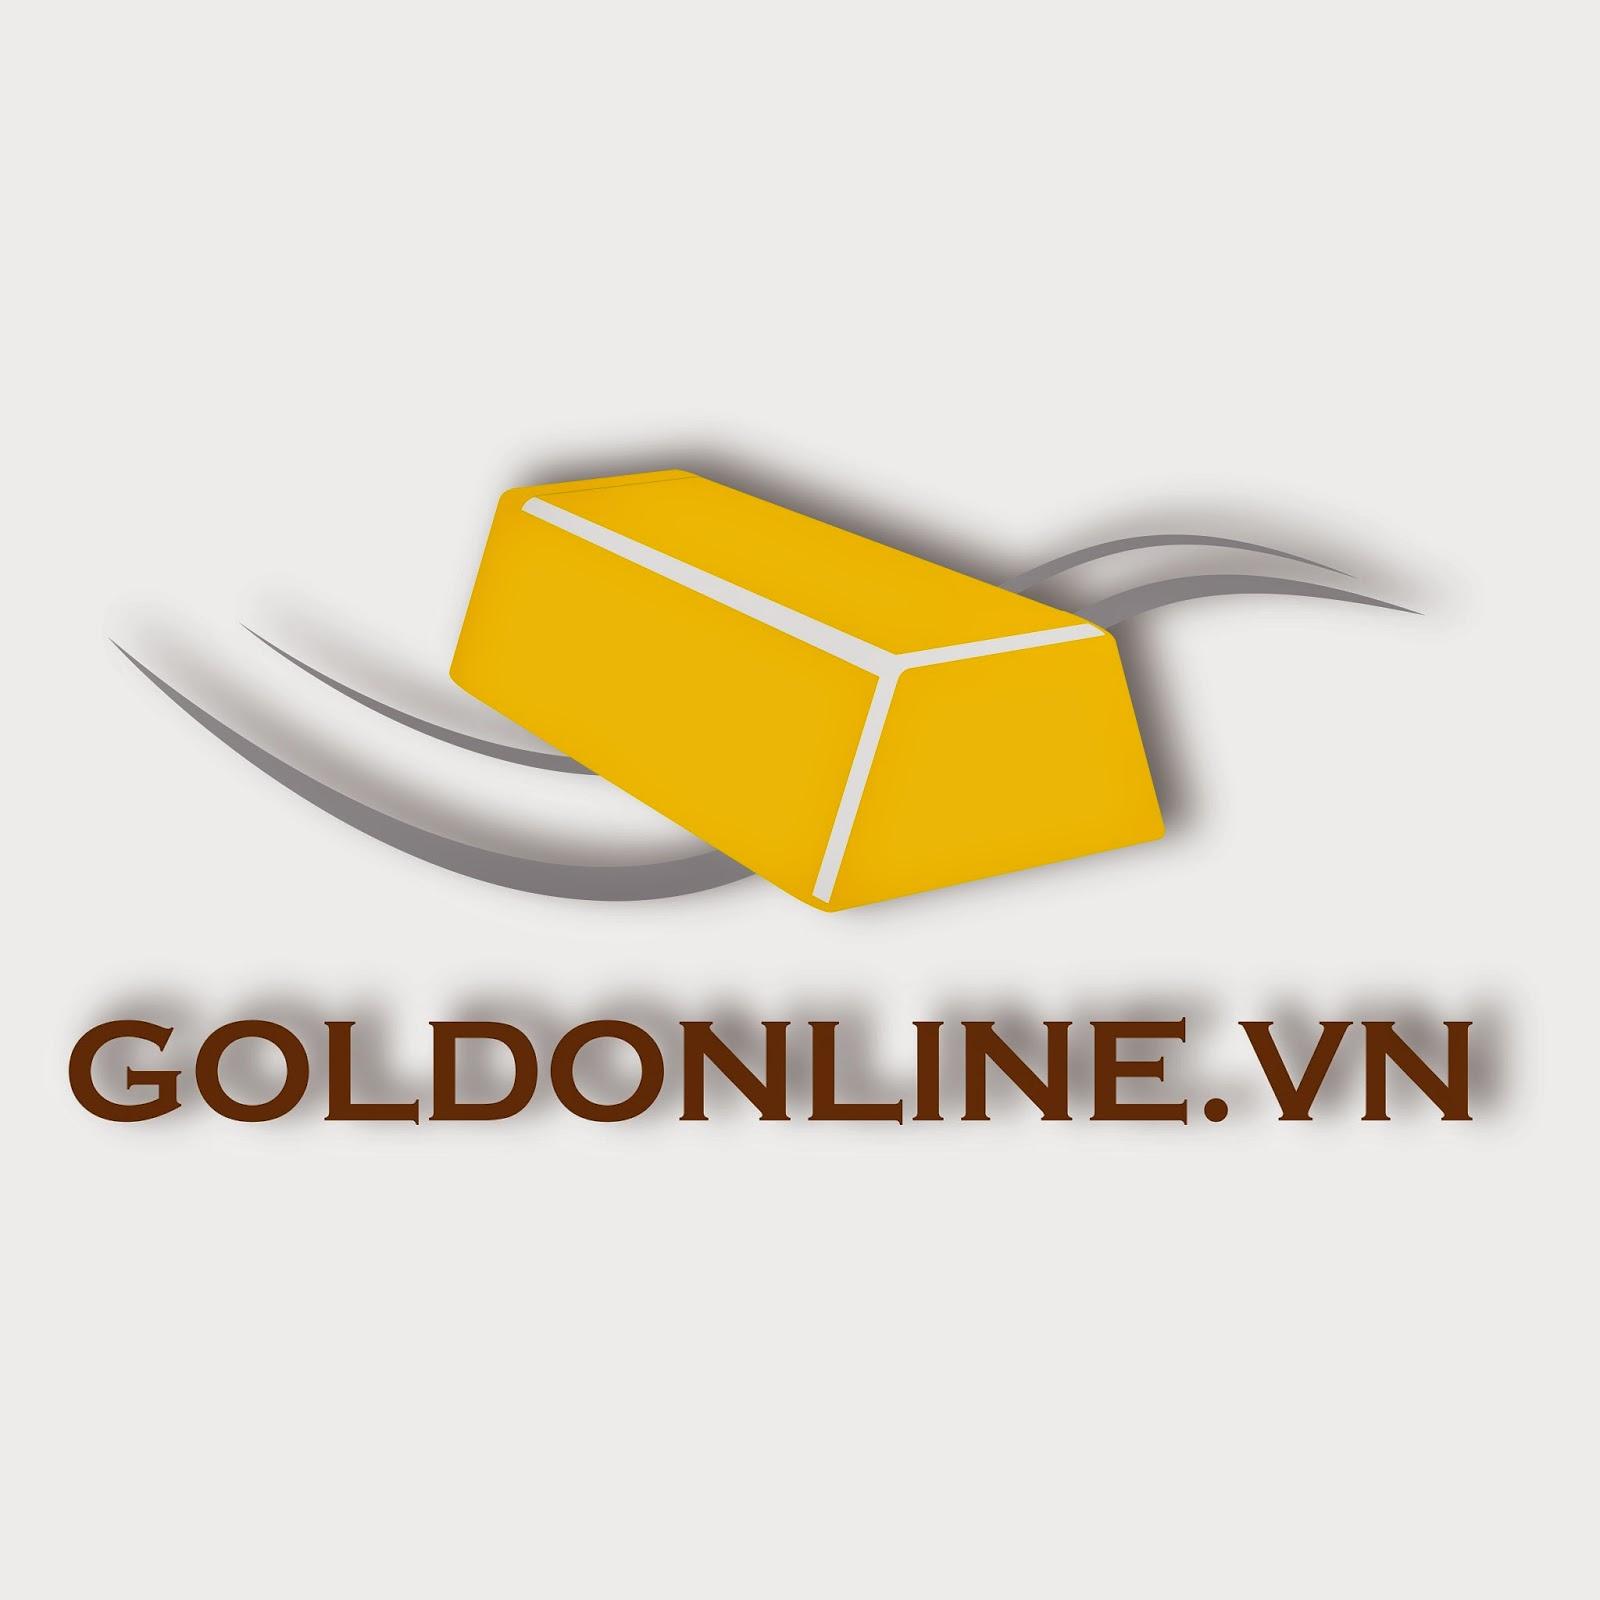 Goldonline